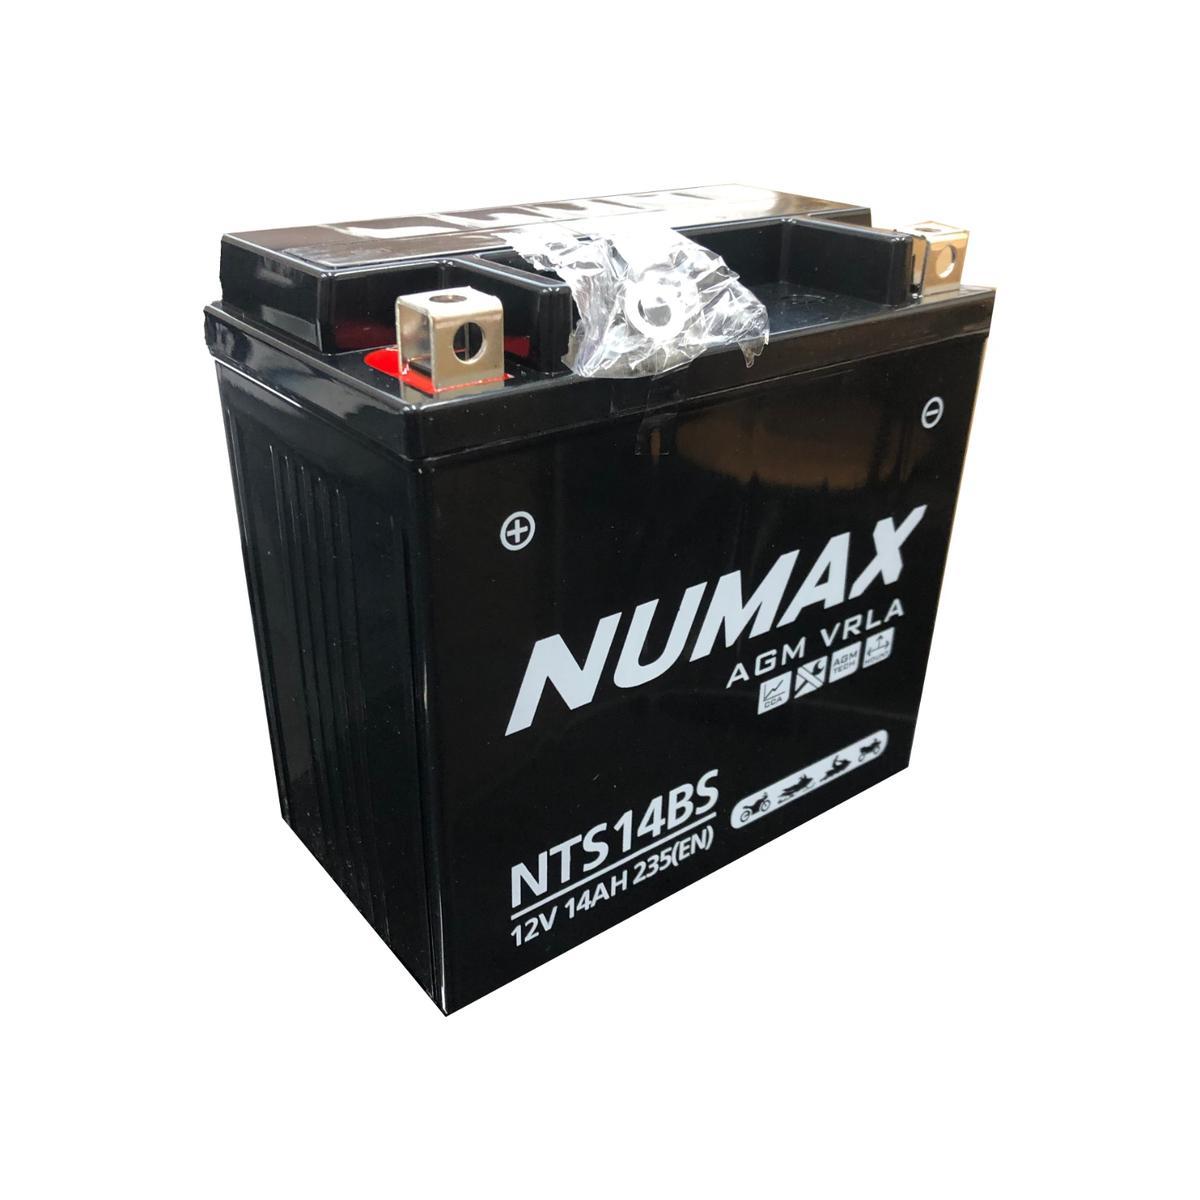 Numax NTS14BS 12v Motorbike Bike Battery YAMAHA 1200cc XJR1200 YTX14-4